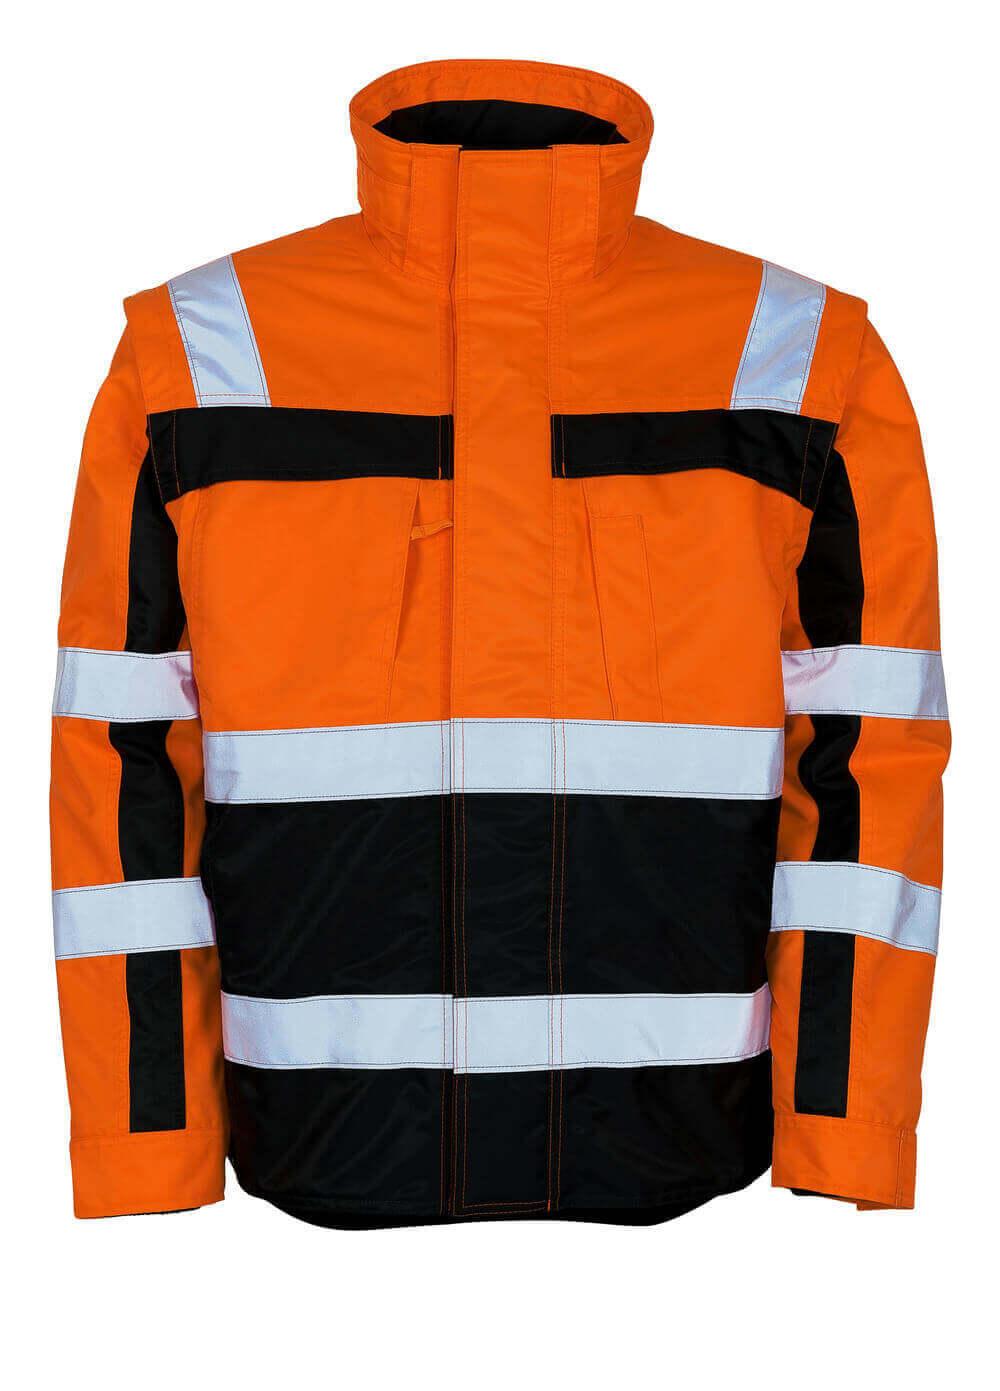 09335-880-141 Winter Jacket - hi-vis orange/navy